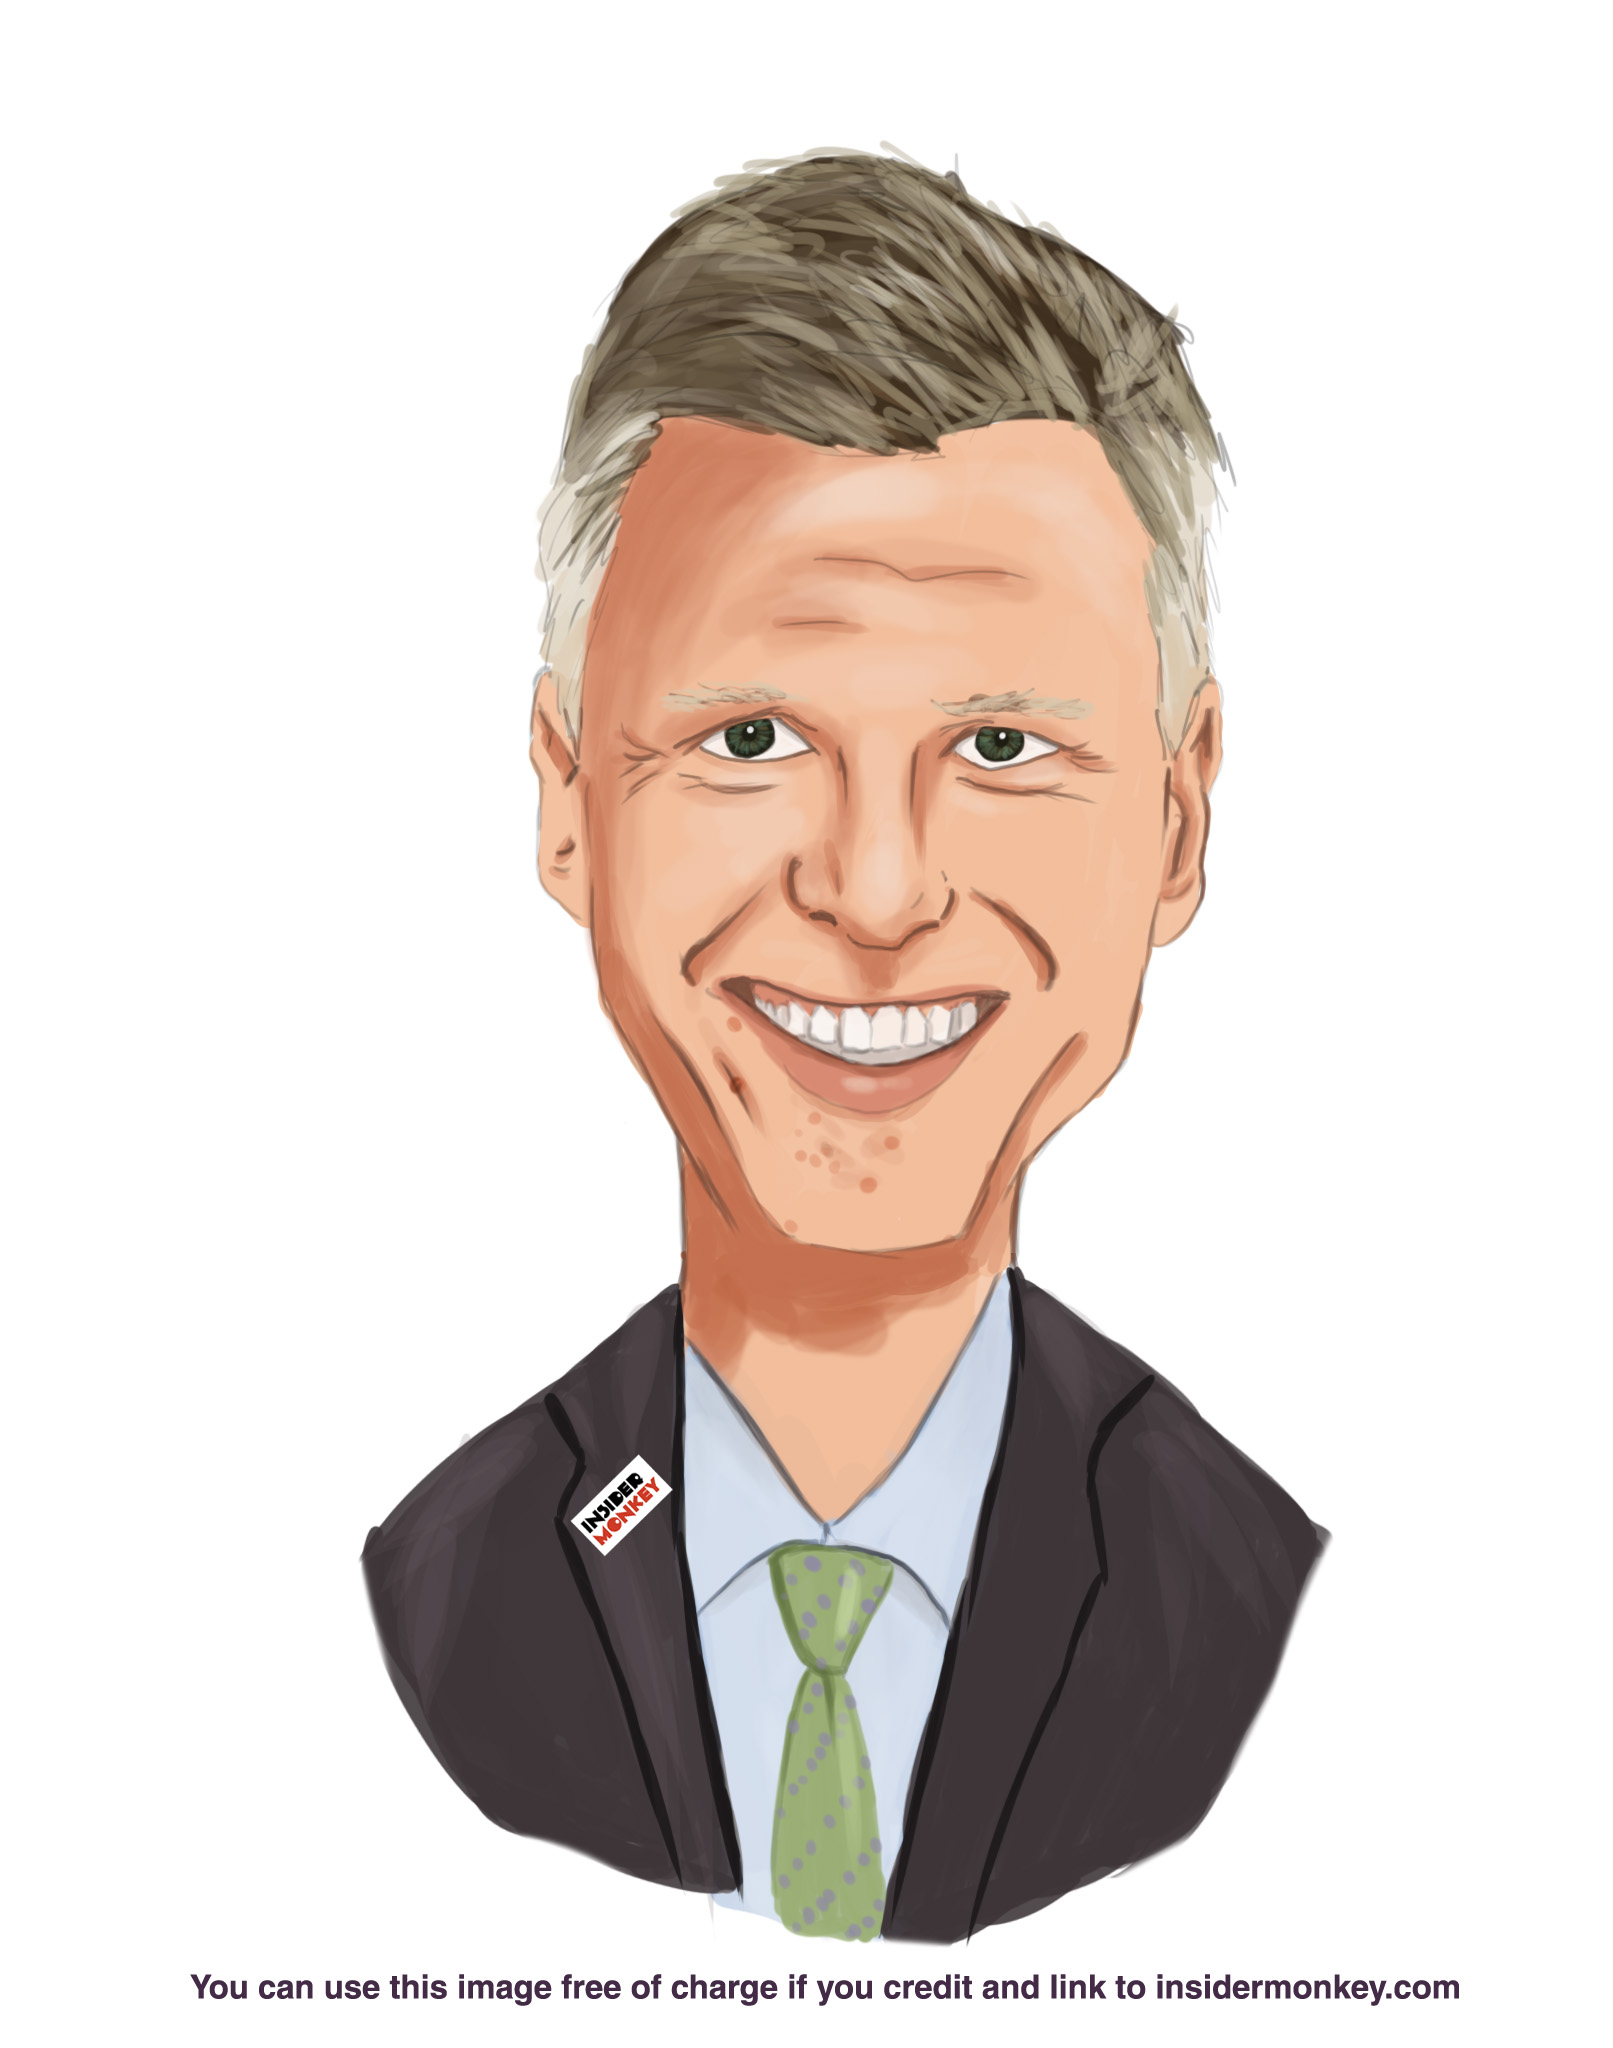 Rudy Kluiber of GRT Capital Partners